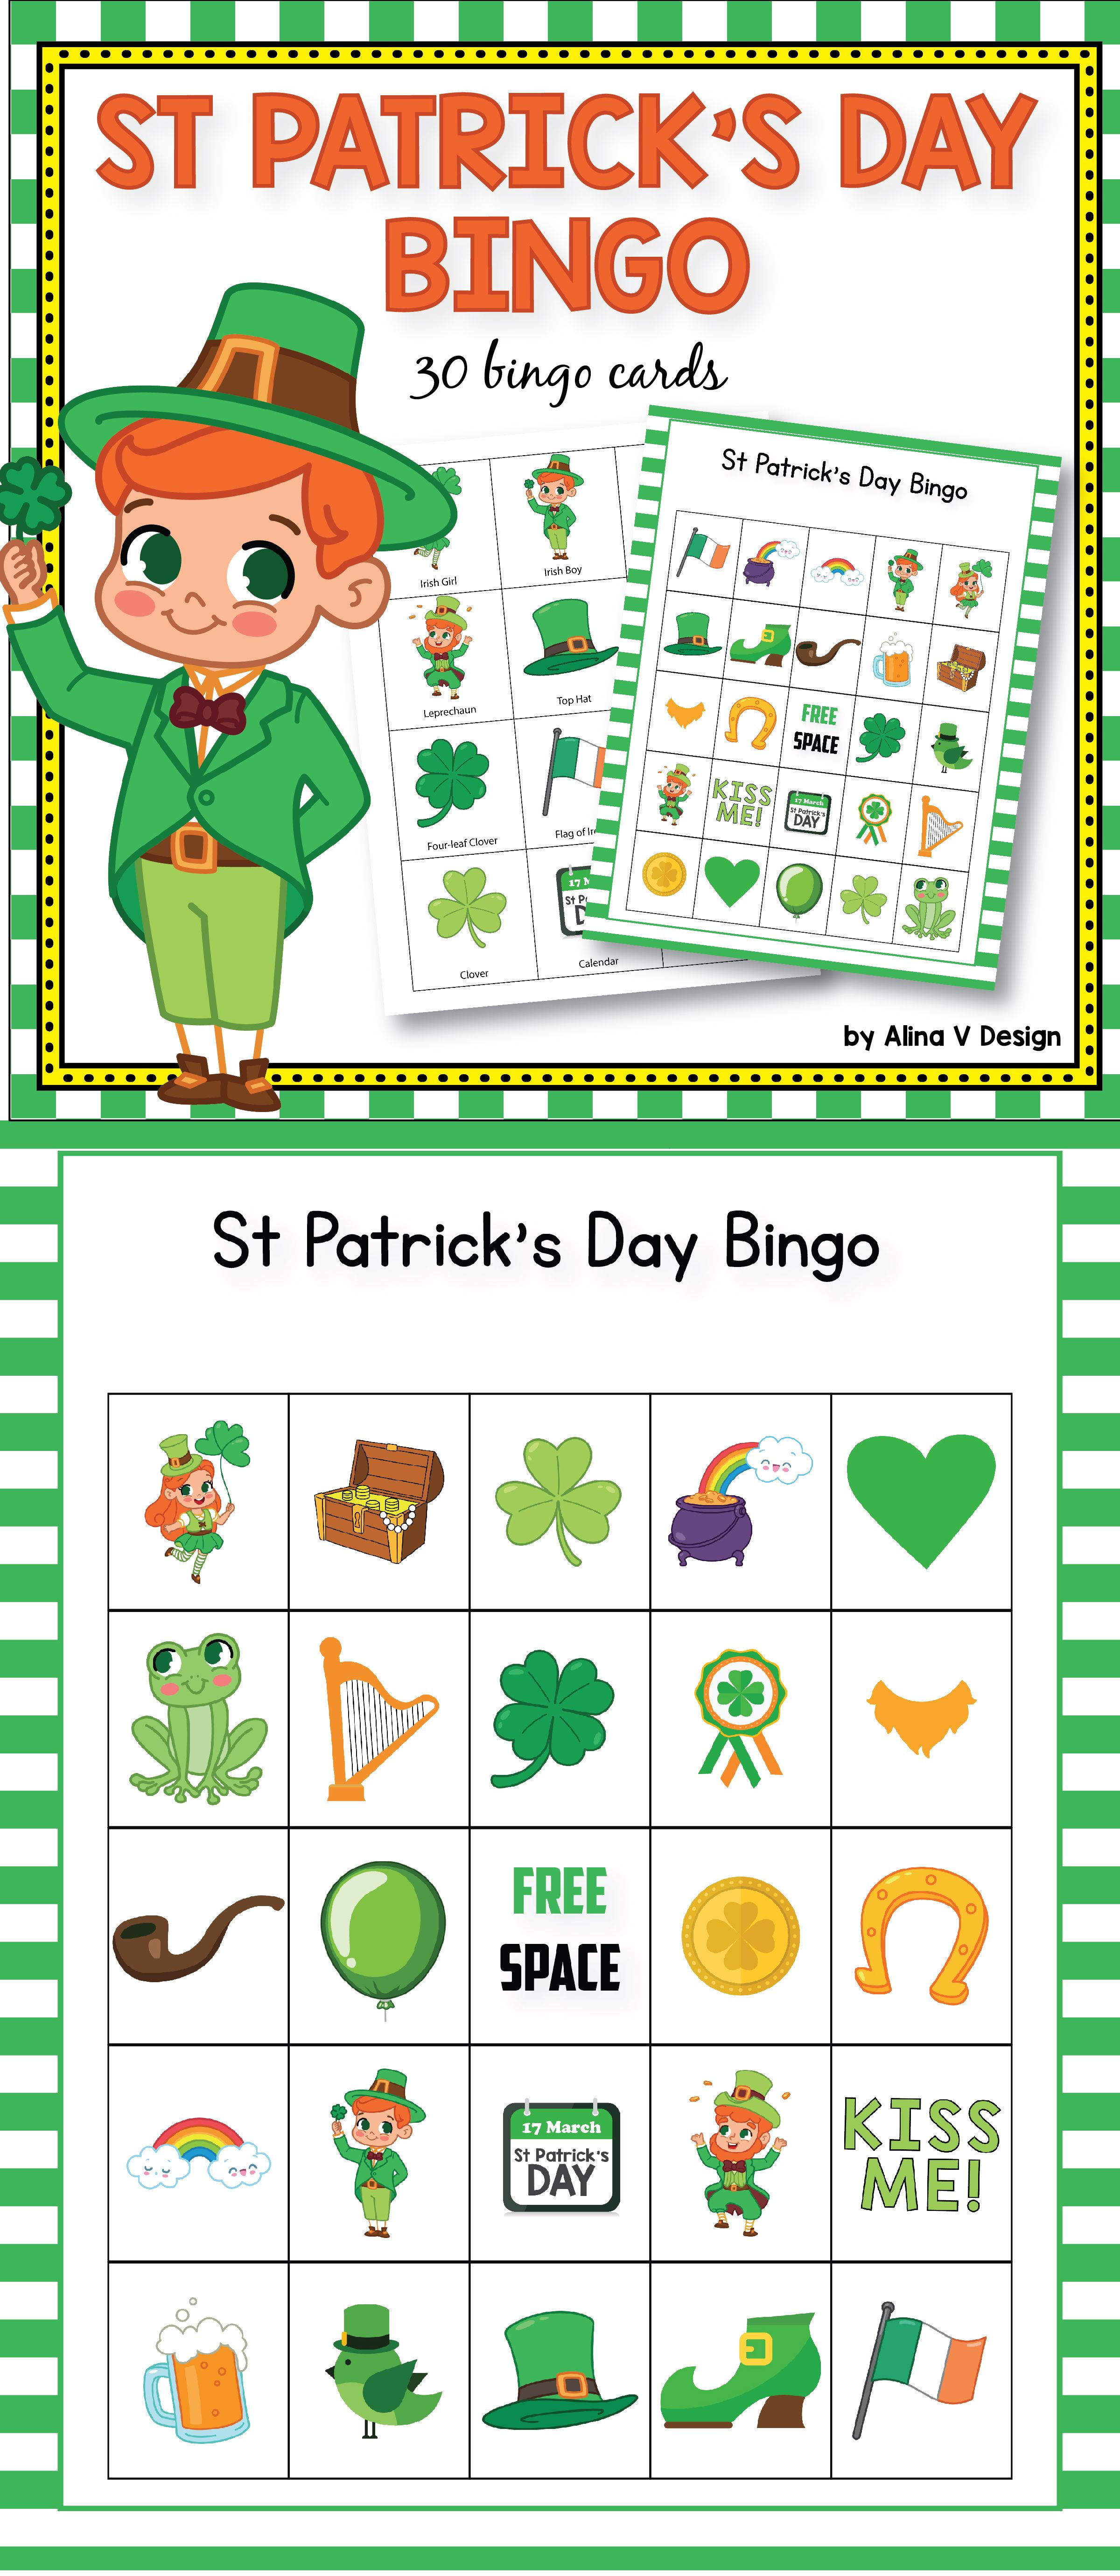 photo about St Patrick's Day Bingo Printable called St Patricks Working day Bingo Video game - St Patricks Working day Actions for